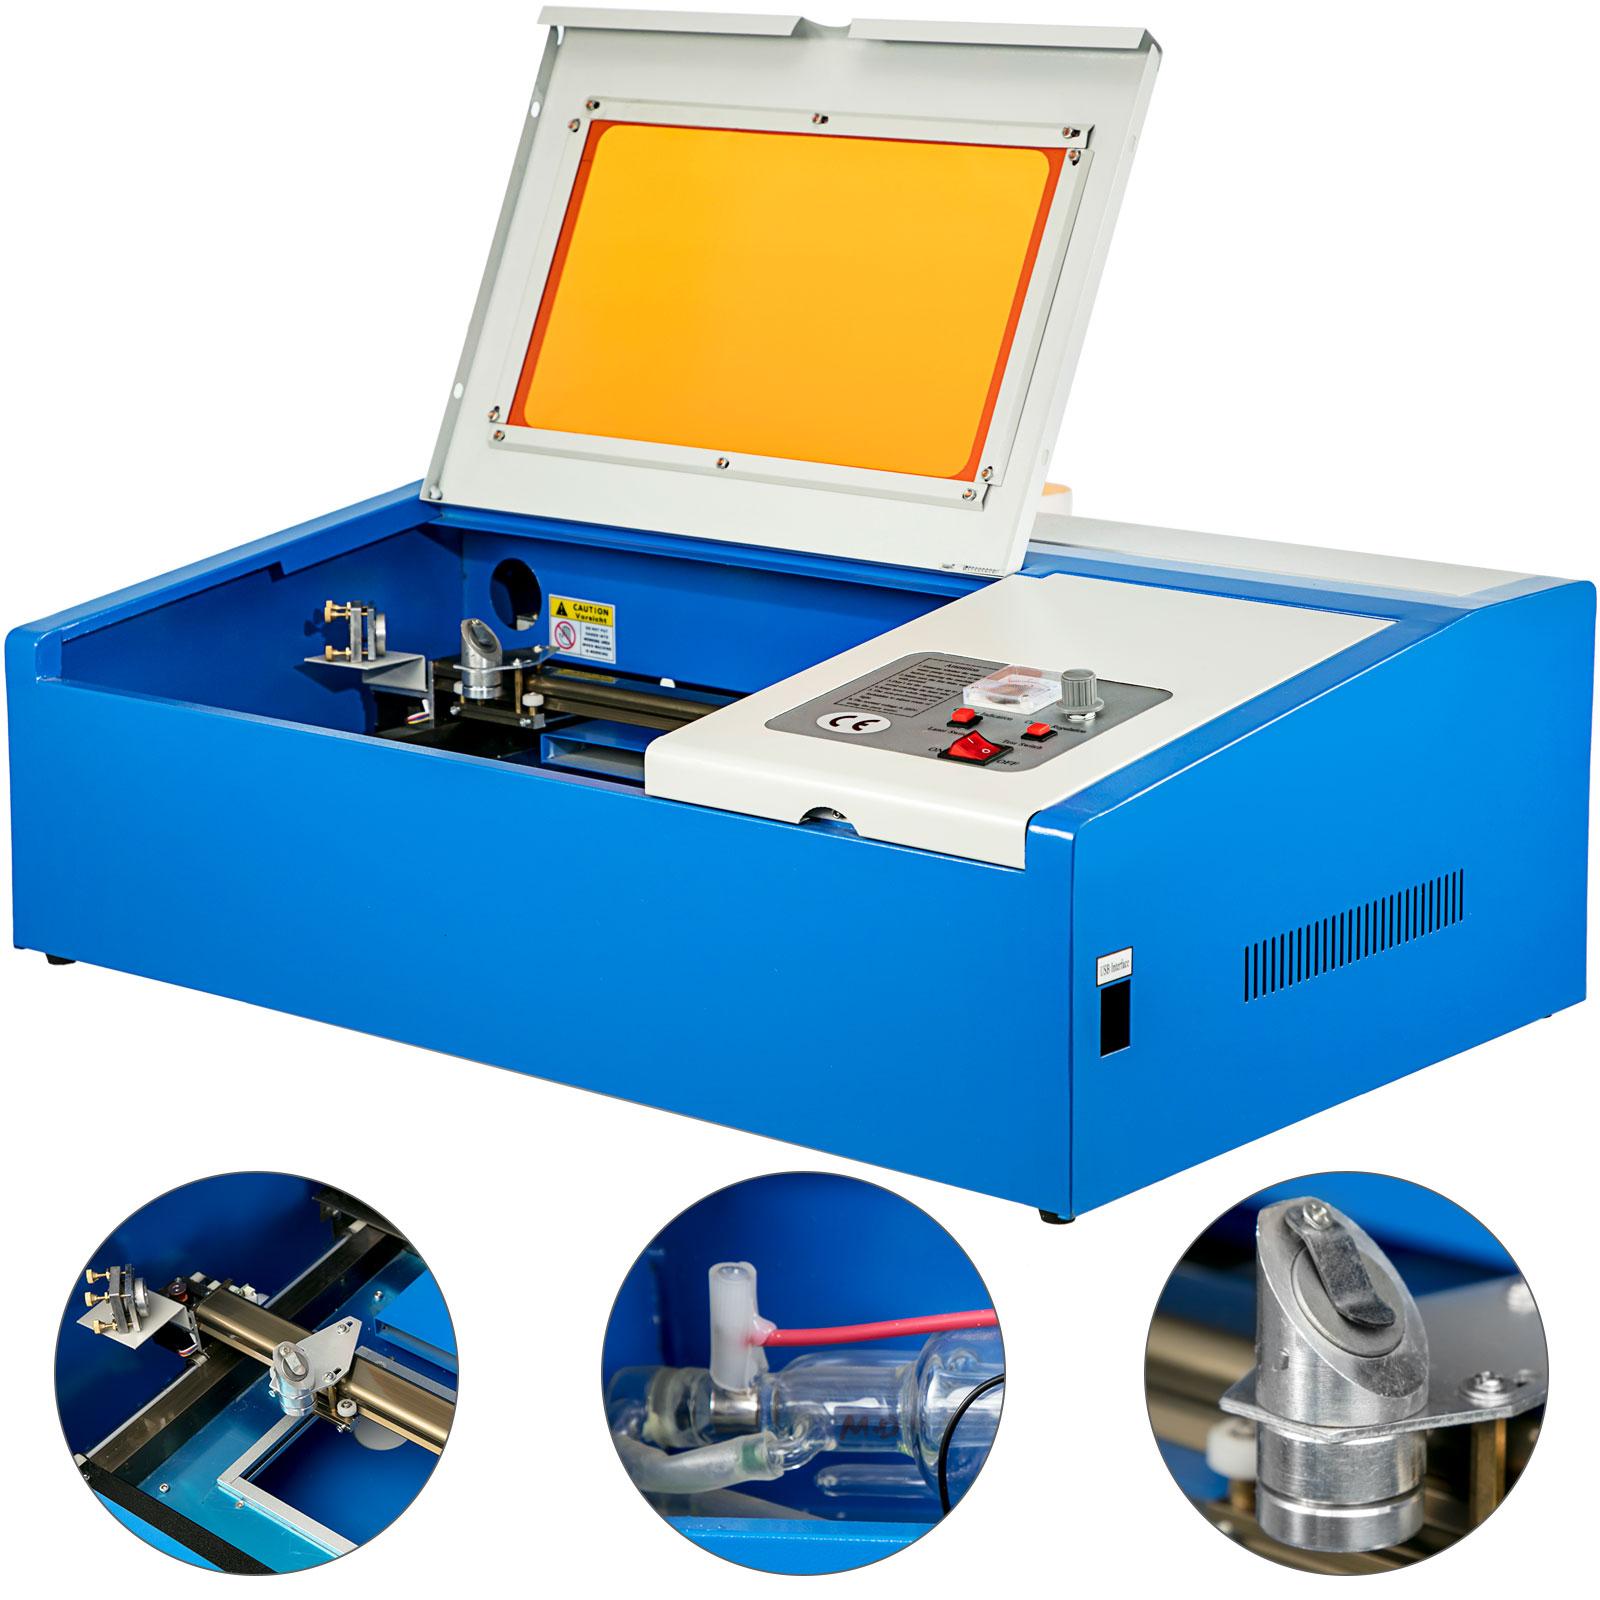 OrangeA L/áser Grabado Para M/áquina 50W M/áquina de Grabado L/áser USB Port de Grabado M/áquina Laser Engraving Machine 300x500mm 50W